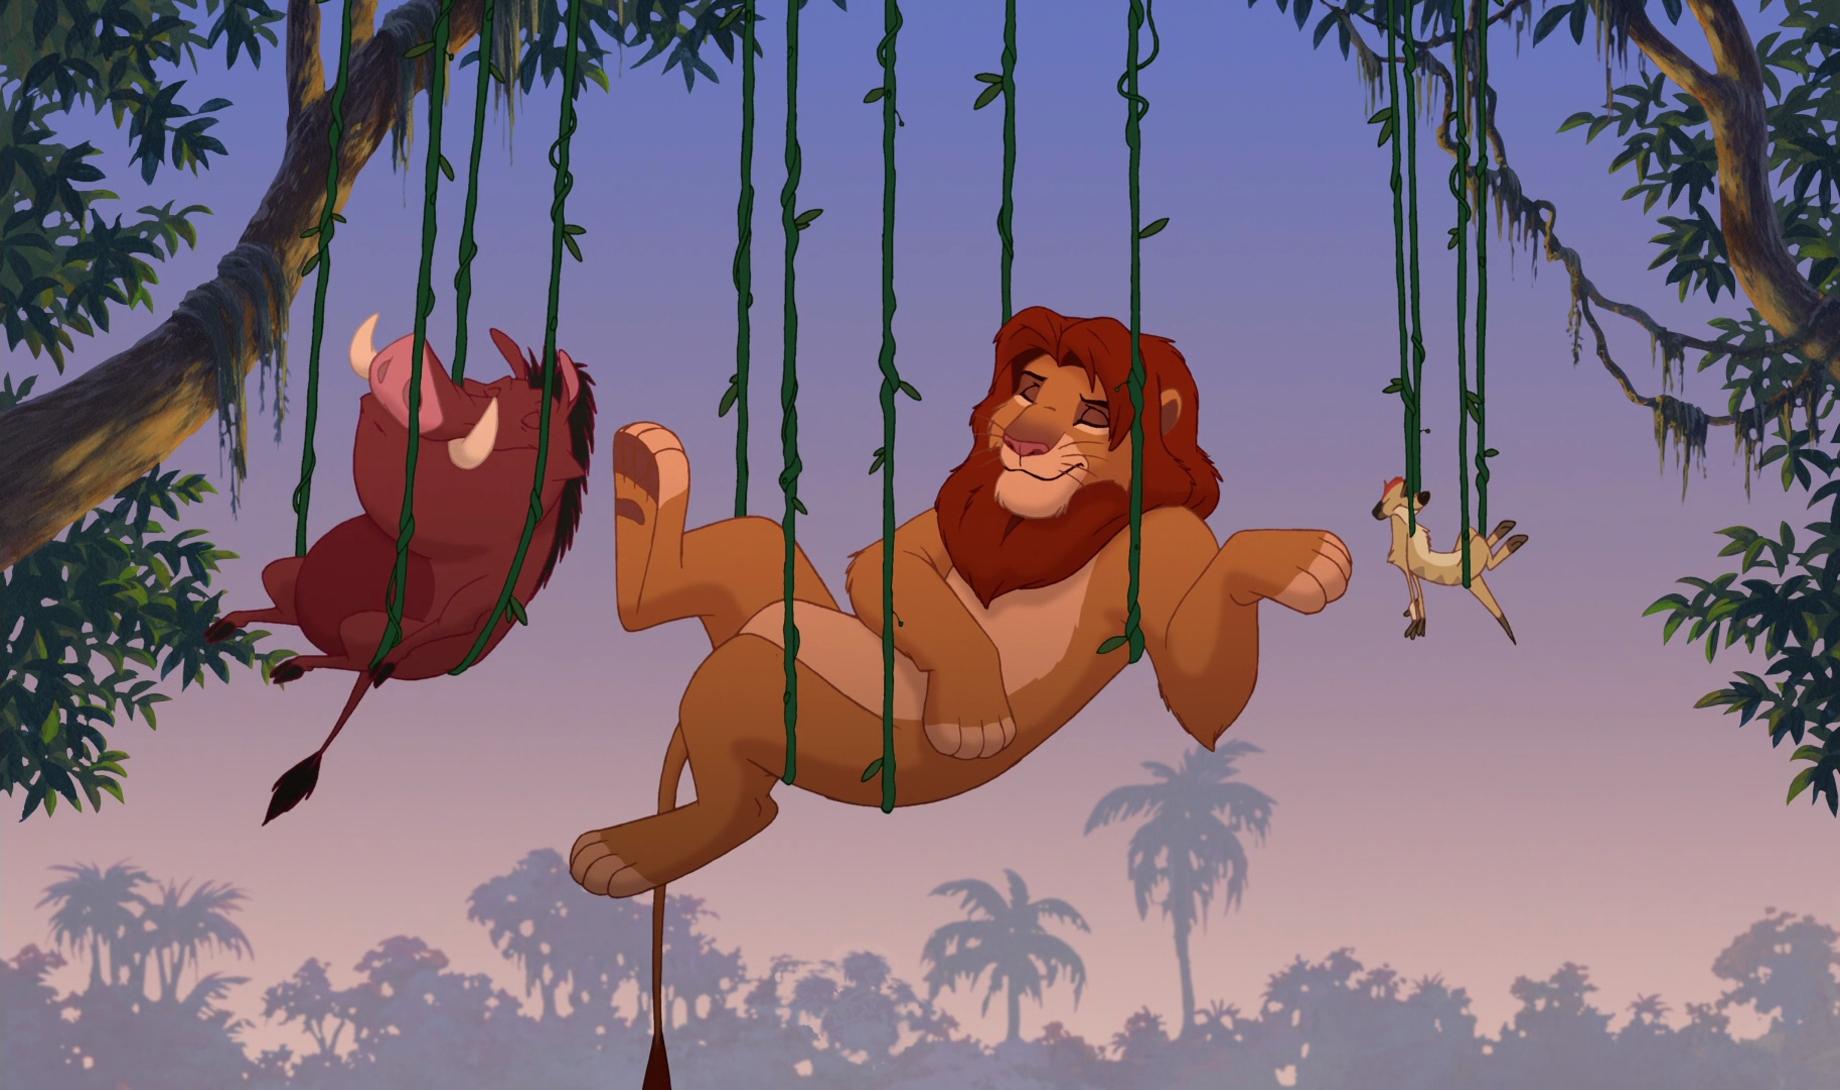 Il re leone 3 hakuna matata wikipedia